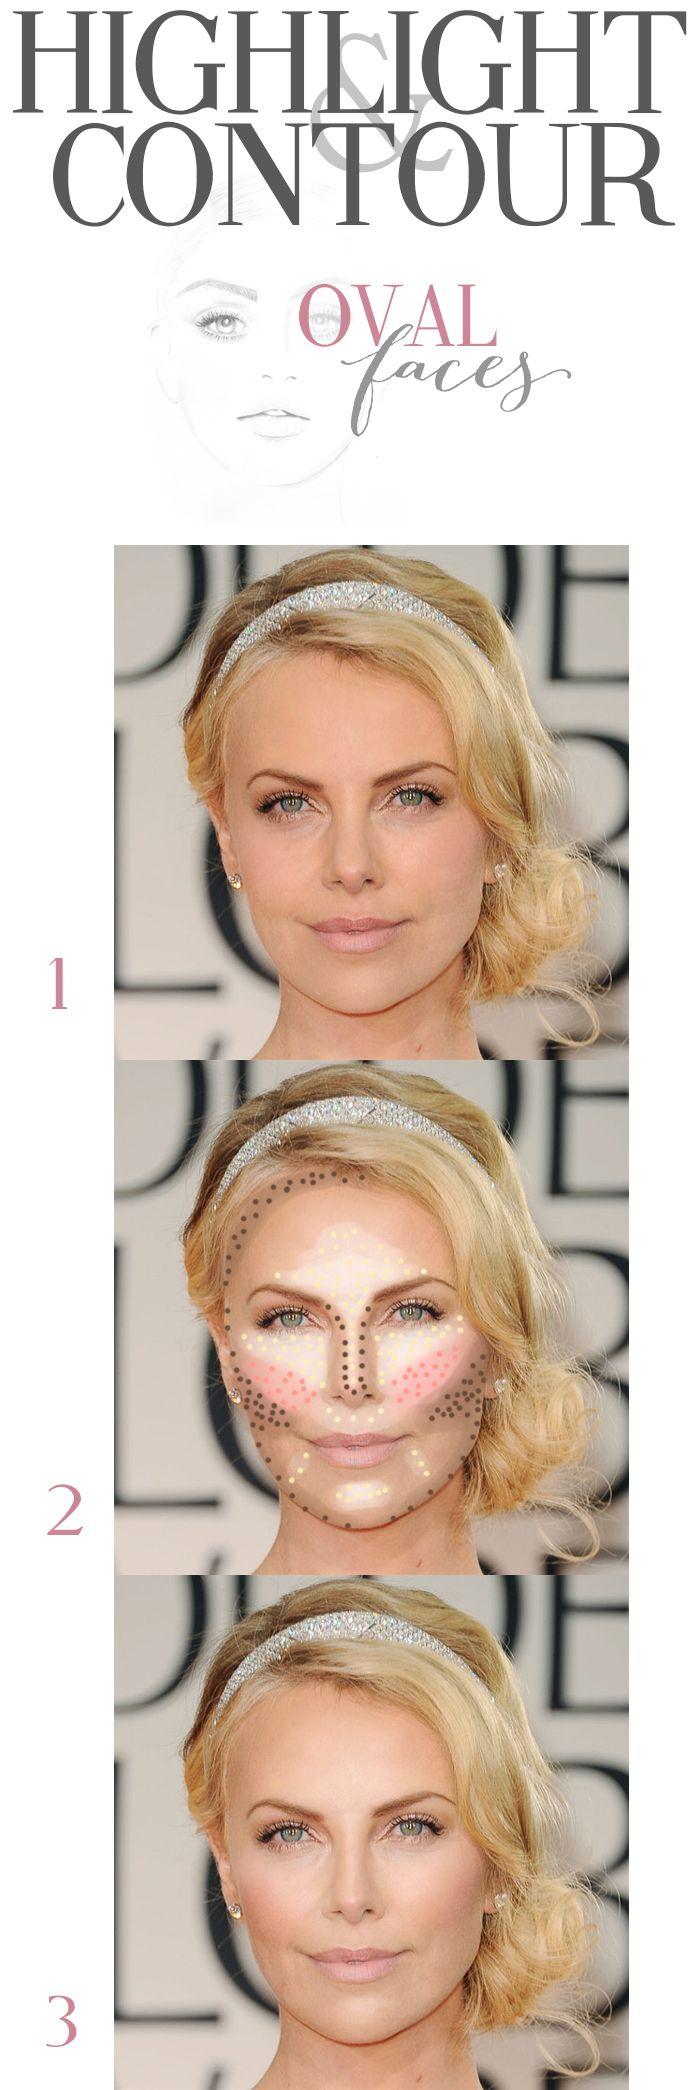 "Face Shape ""oval"" highlight and contouring patterns @Cara K K K K Ferrier"